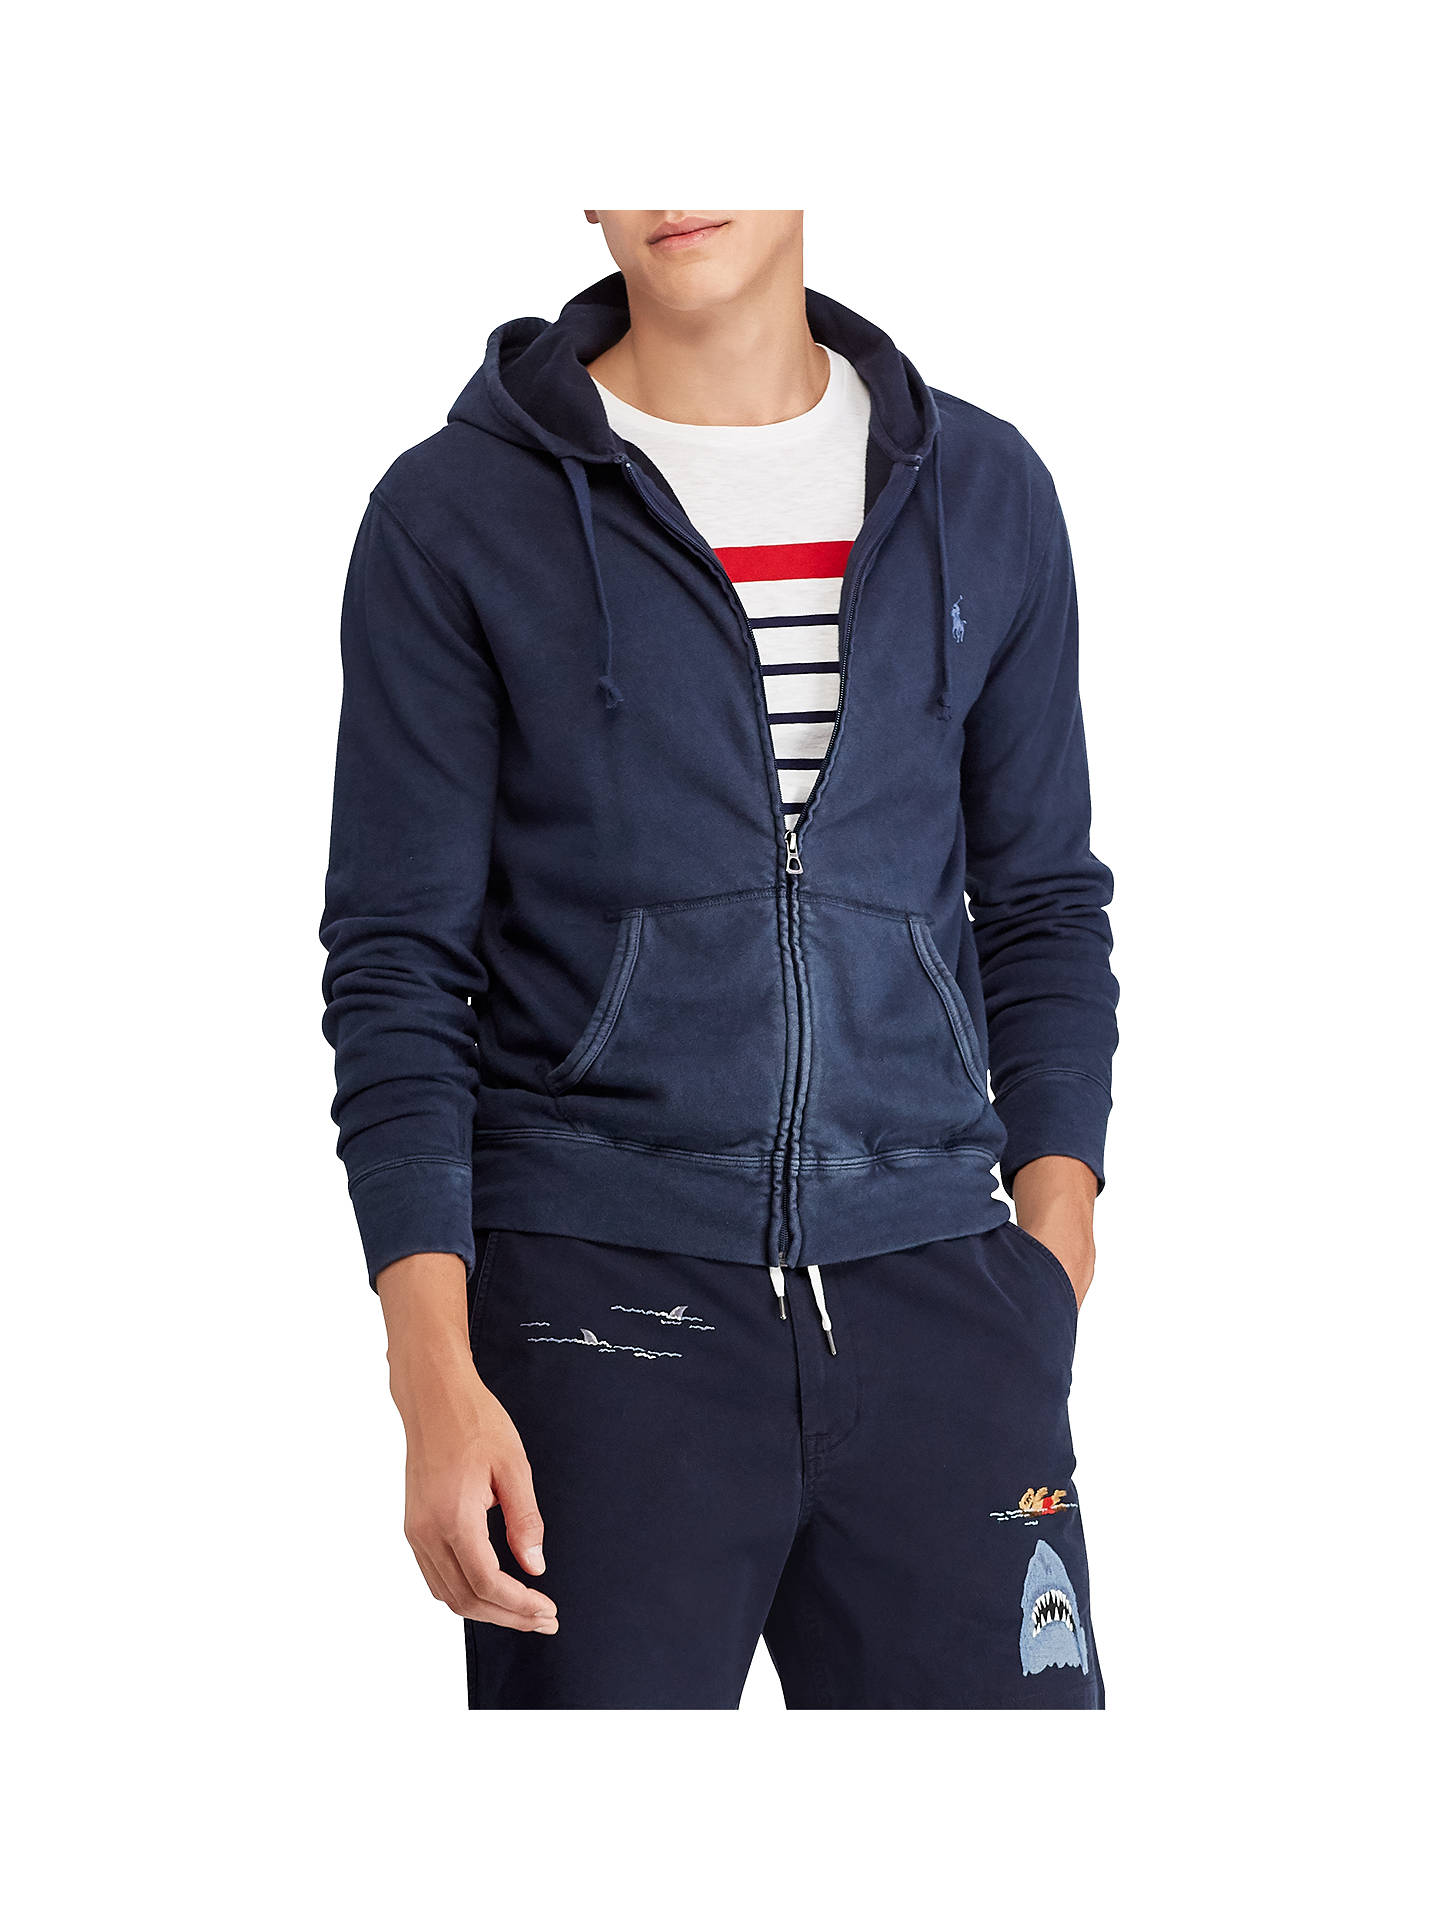 ed5153d7b order buypolo ralph lauren jersey cotton full zip hoodie aviator navy m  online at johnlewis e1caf